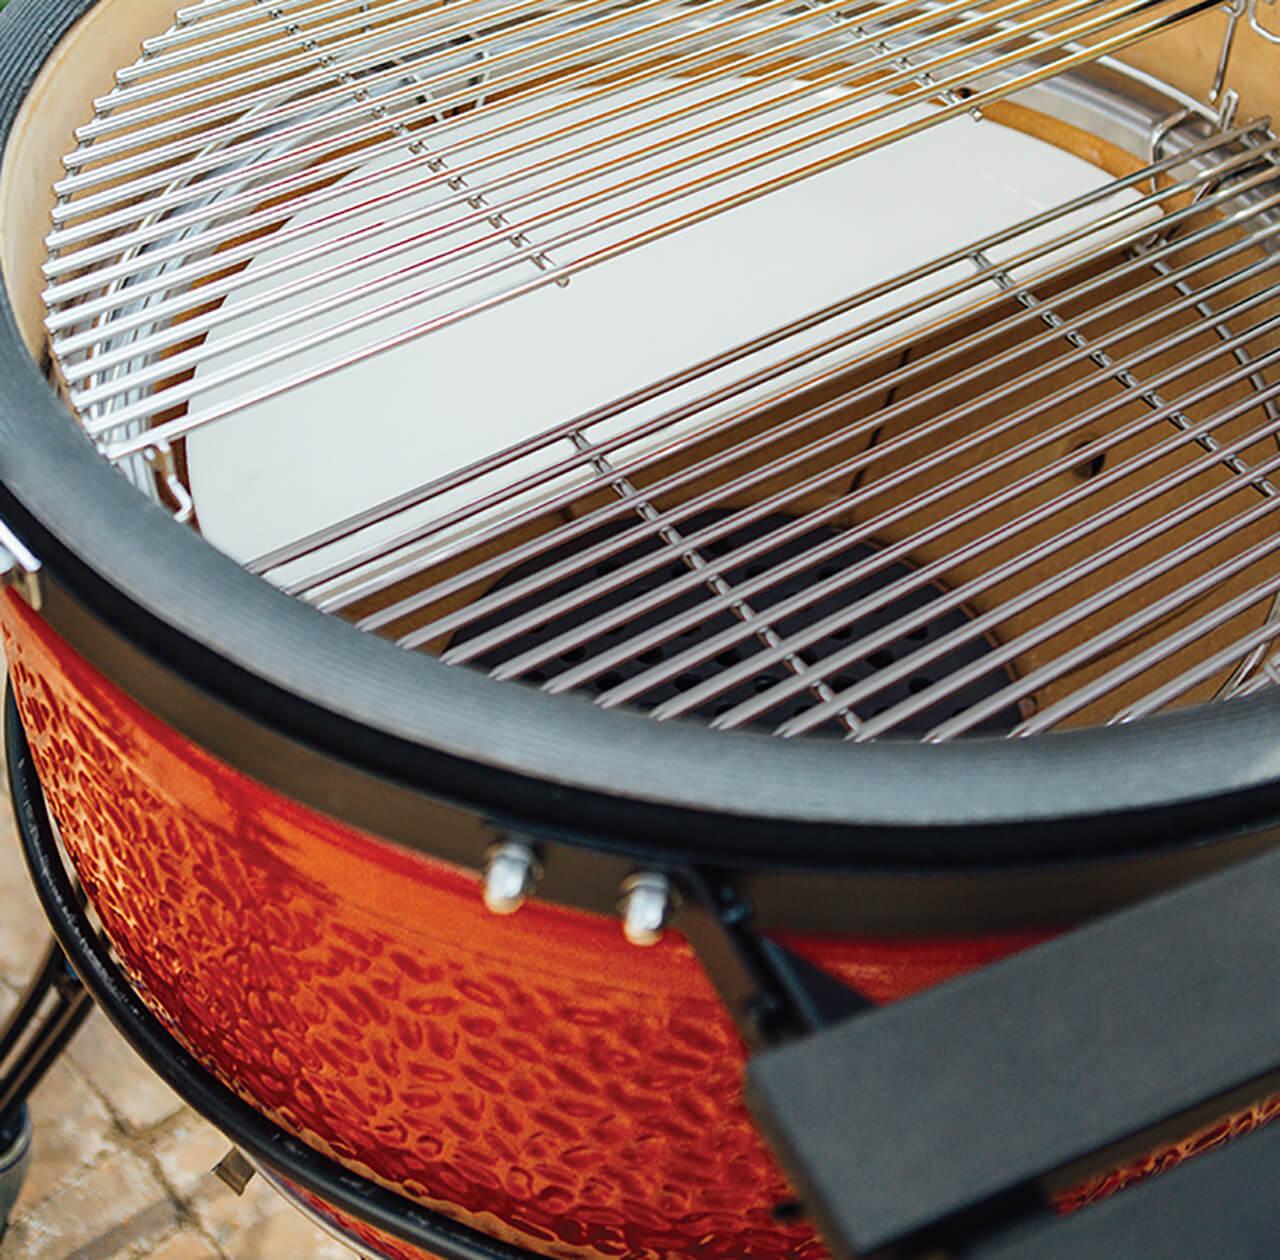 Kamado Joe ProJoe — Top Grills - Nebraska's Spot For BBQ Smokers